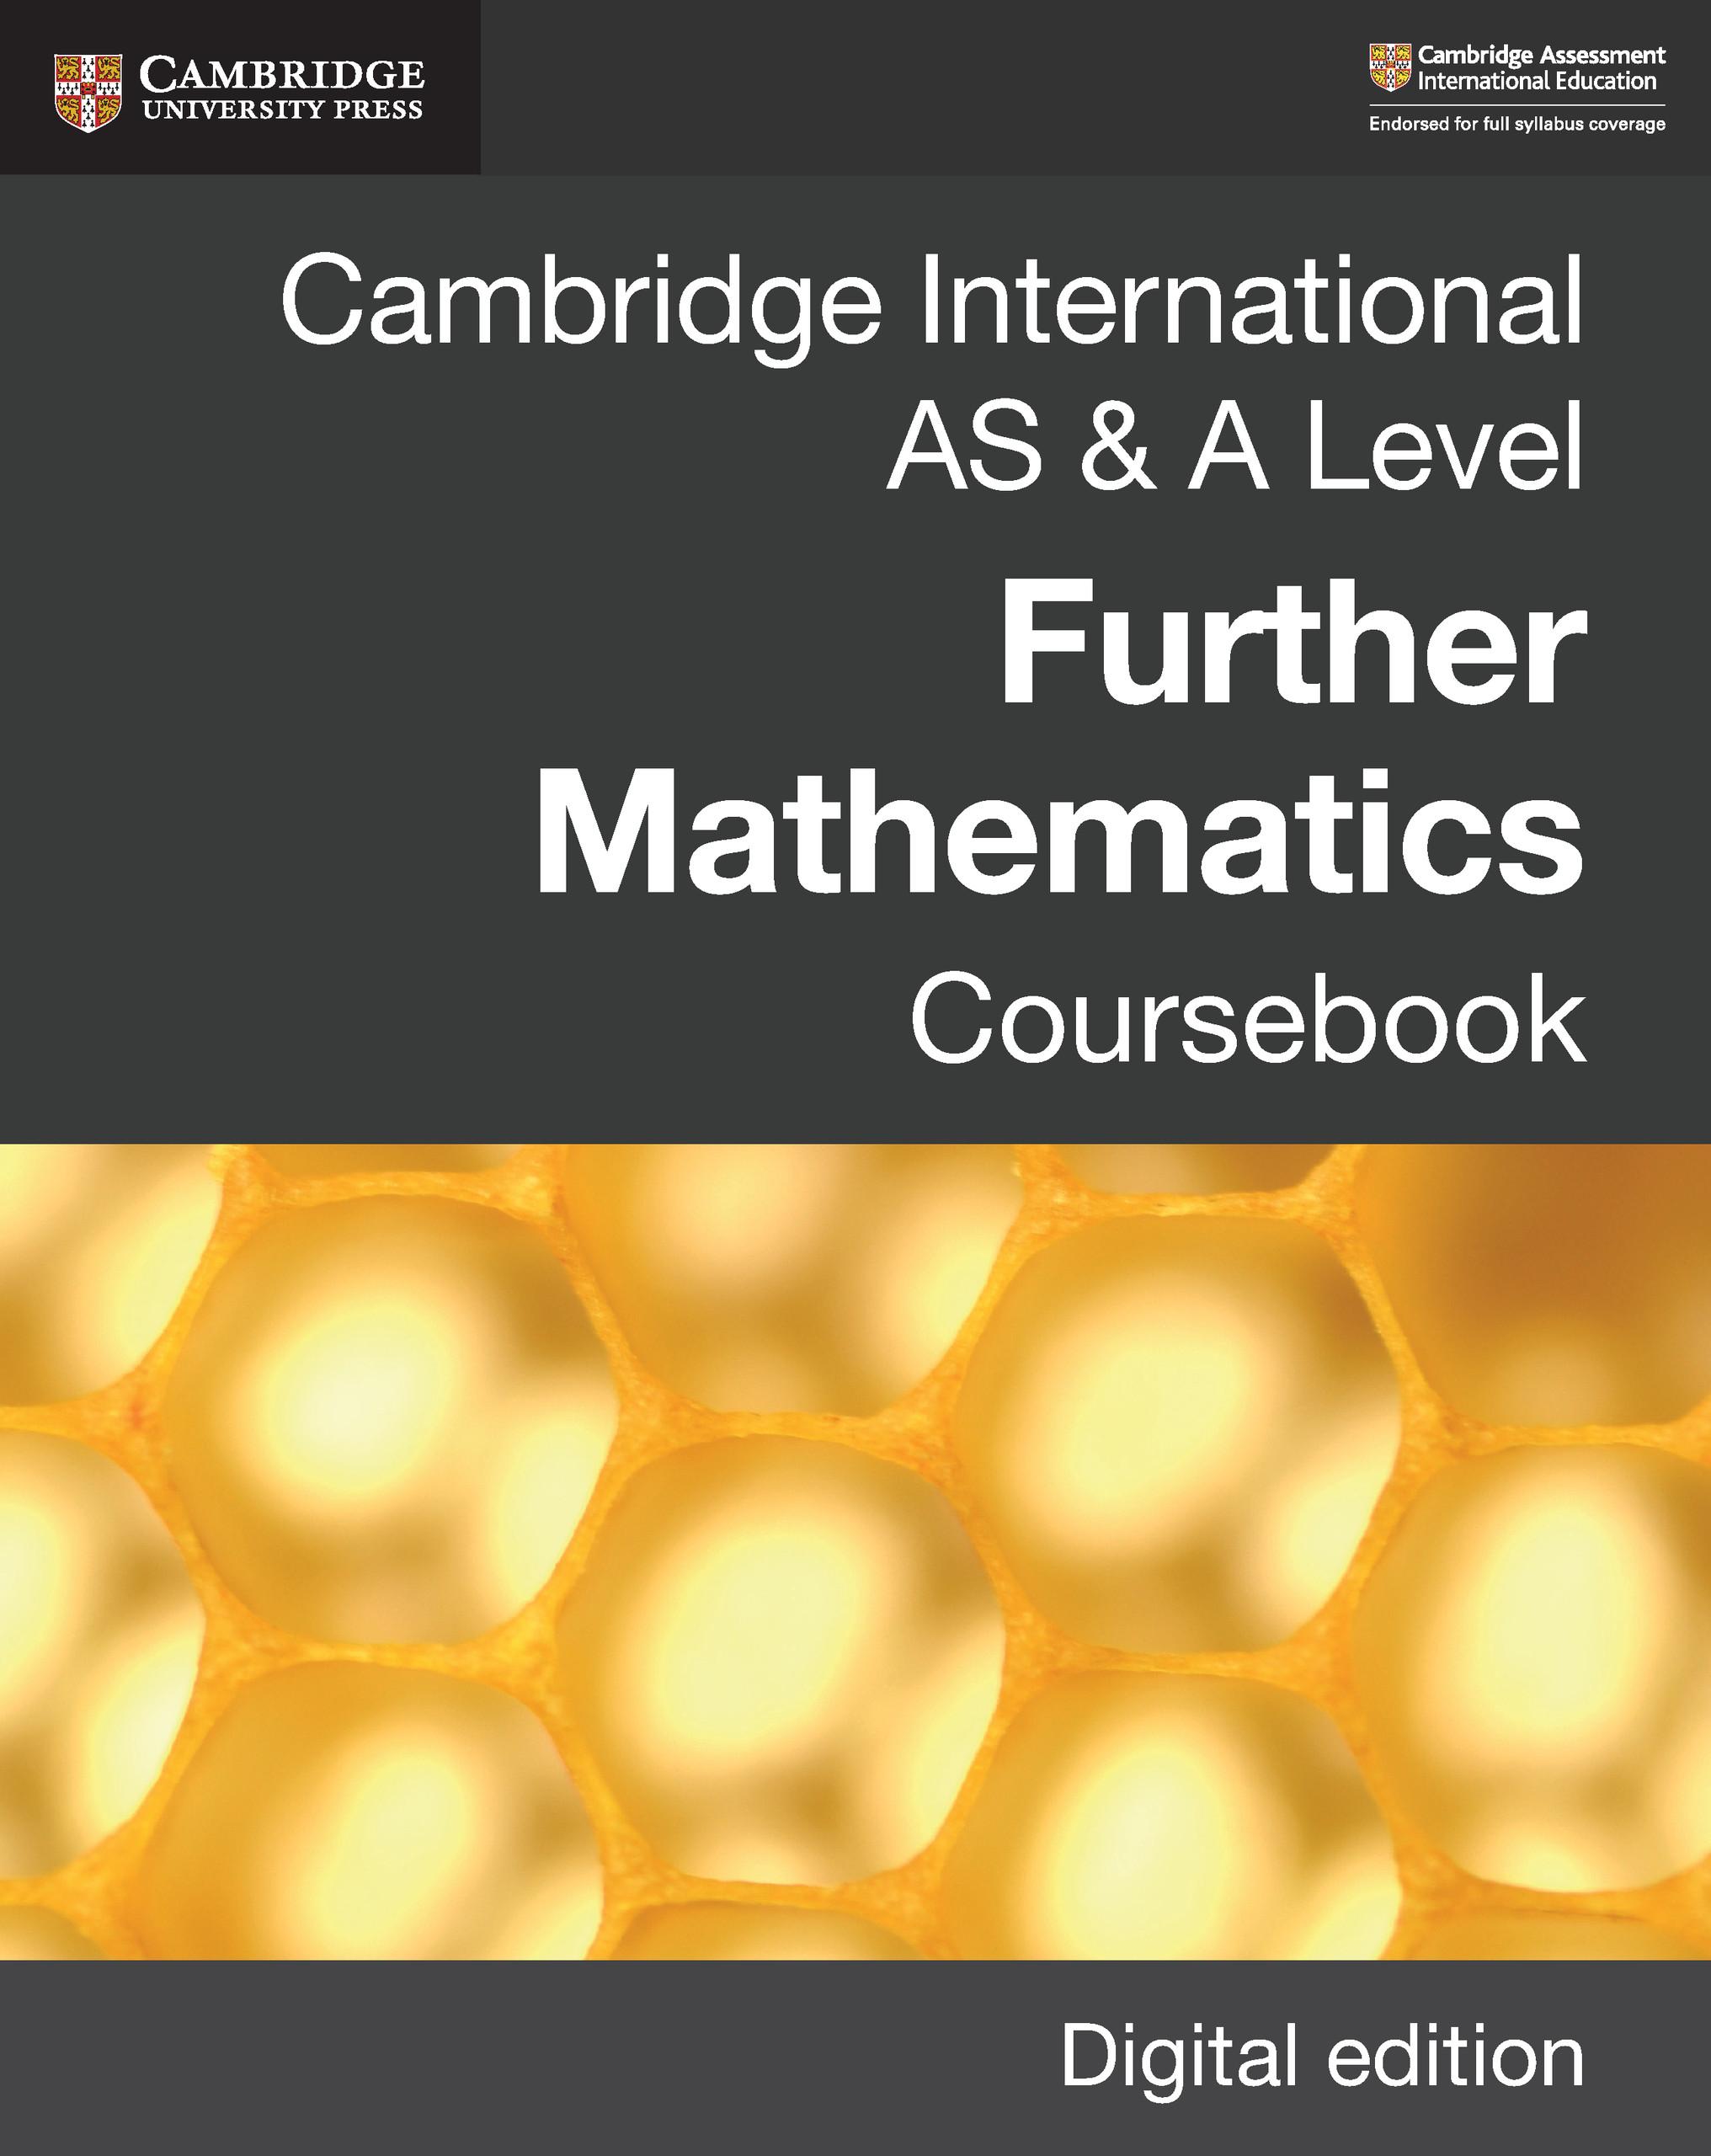 Cambridge International AS & A Level Further Mathematics Coursebook Digital Edition - 25-49.99